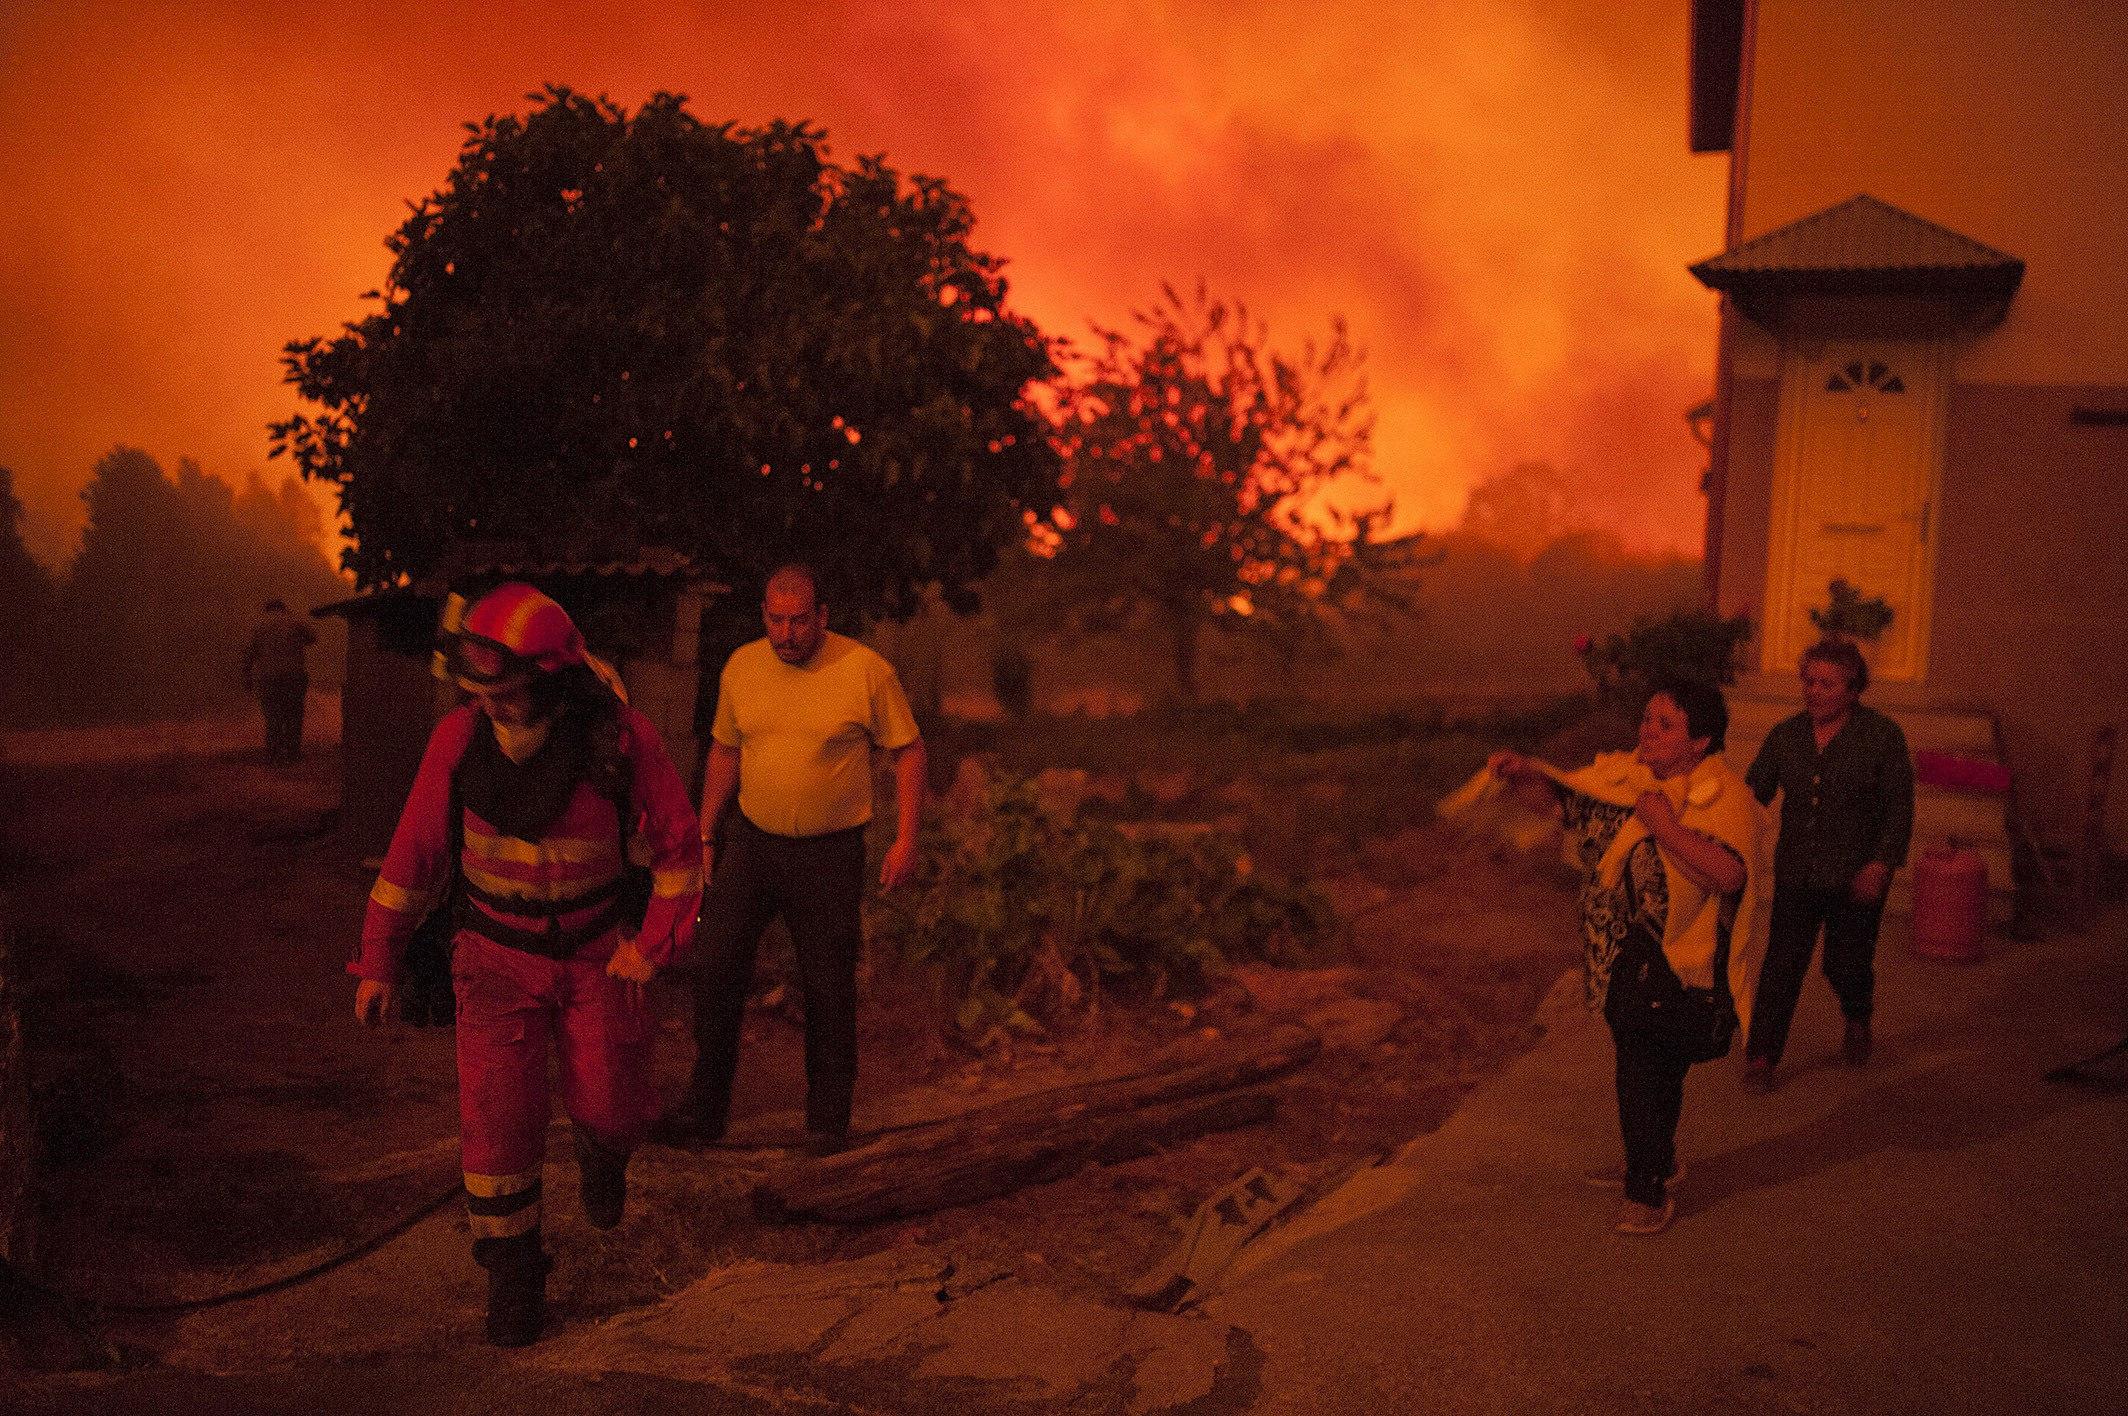 Imatge de l'incendi forestal declarat en el municipi de Verín (Galicia). /BRAIS LORENZO